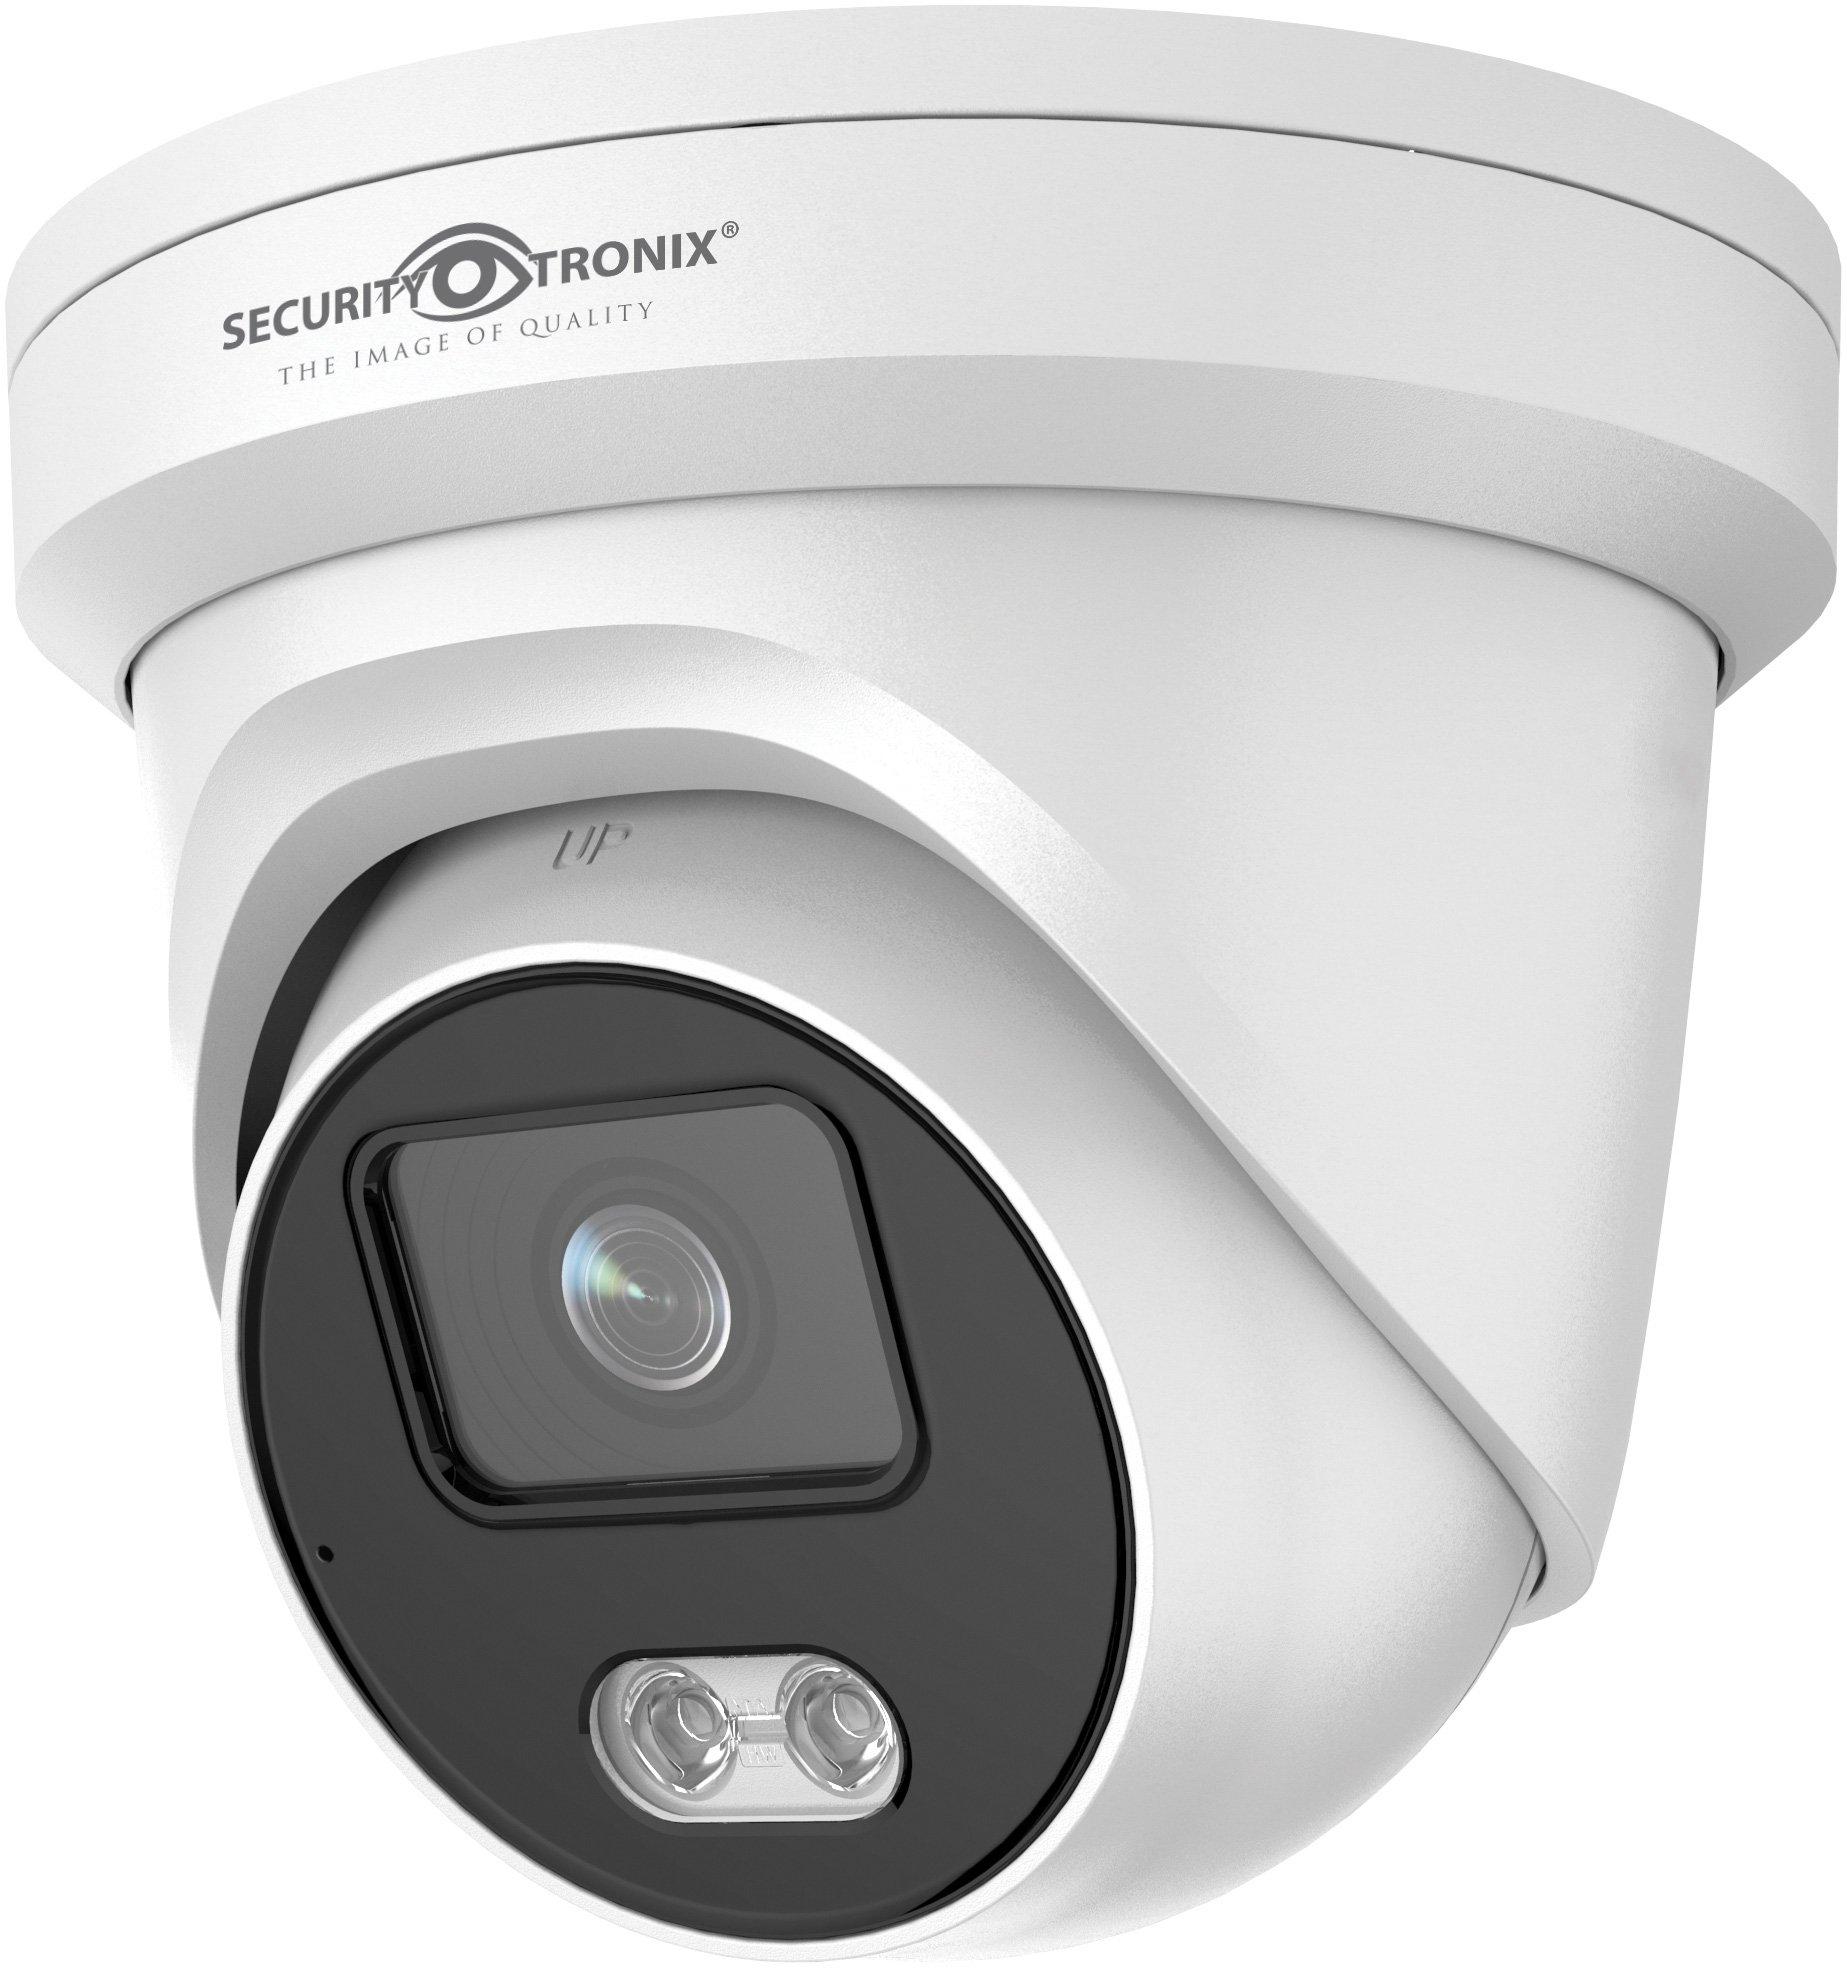 SecurityTronix ST-IP4FTD-CNV 4 MP Chroma IP Fixed Turret Dome Camera SCT-ST-IP4FTDCNV